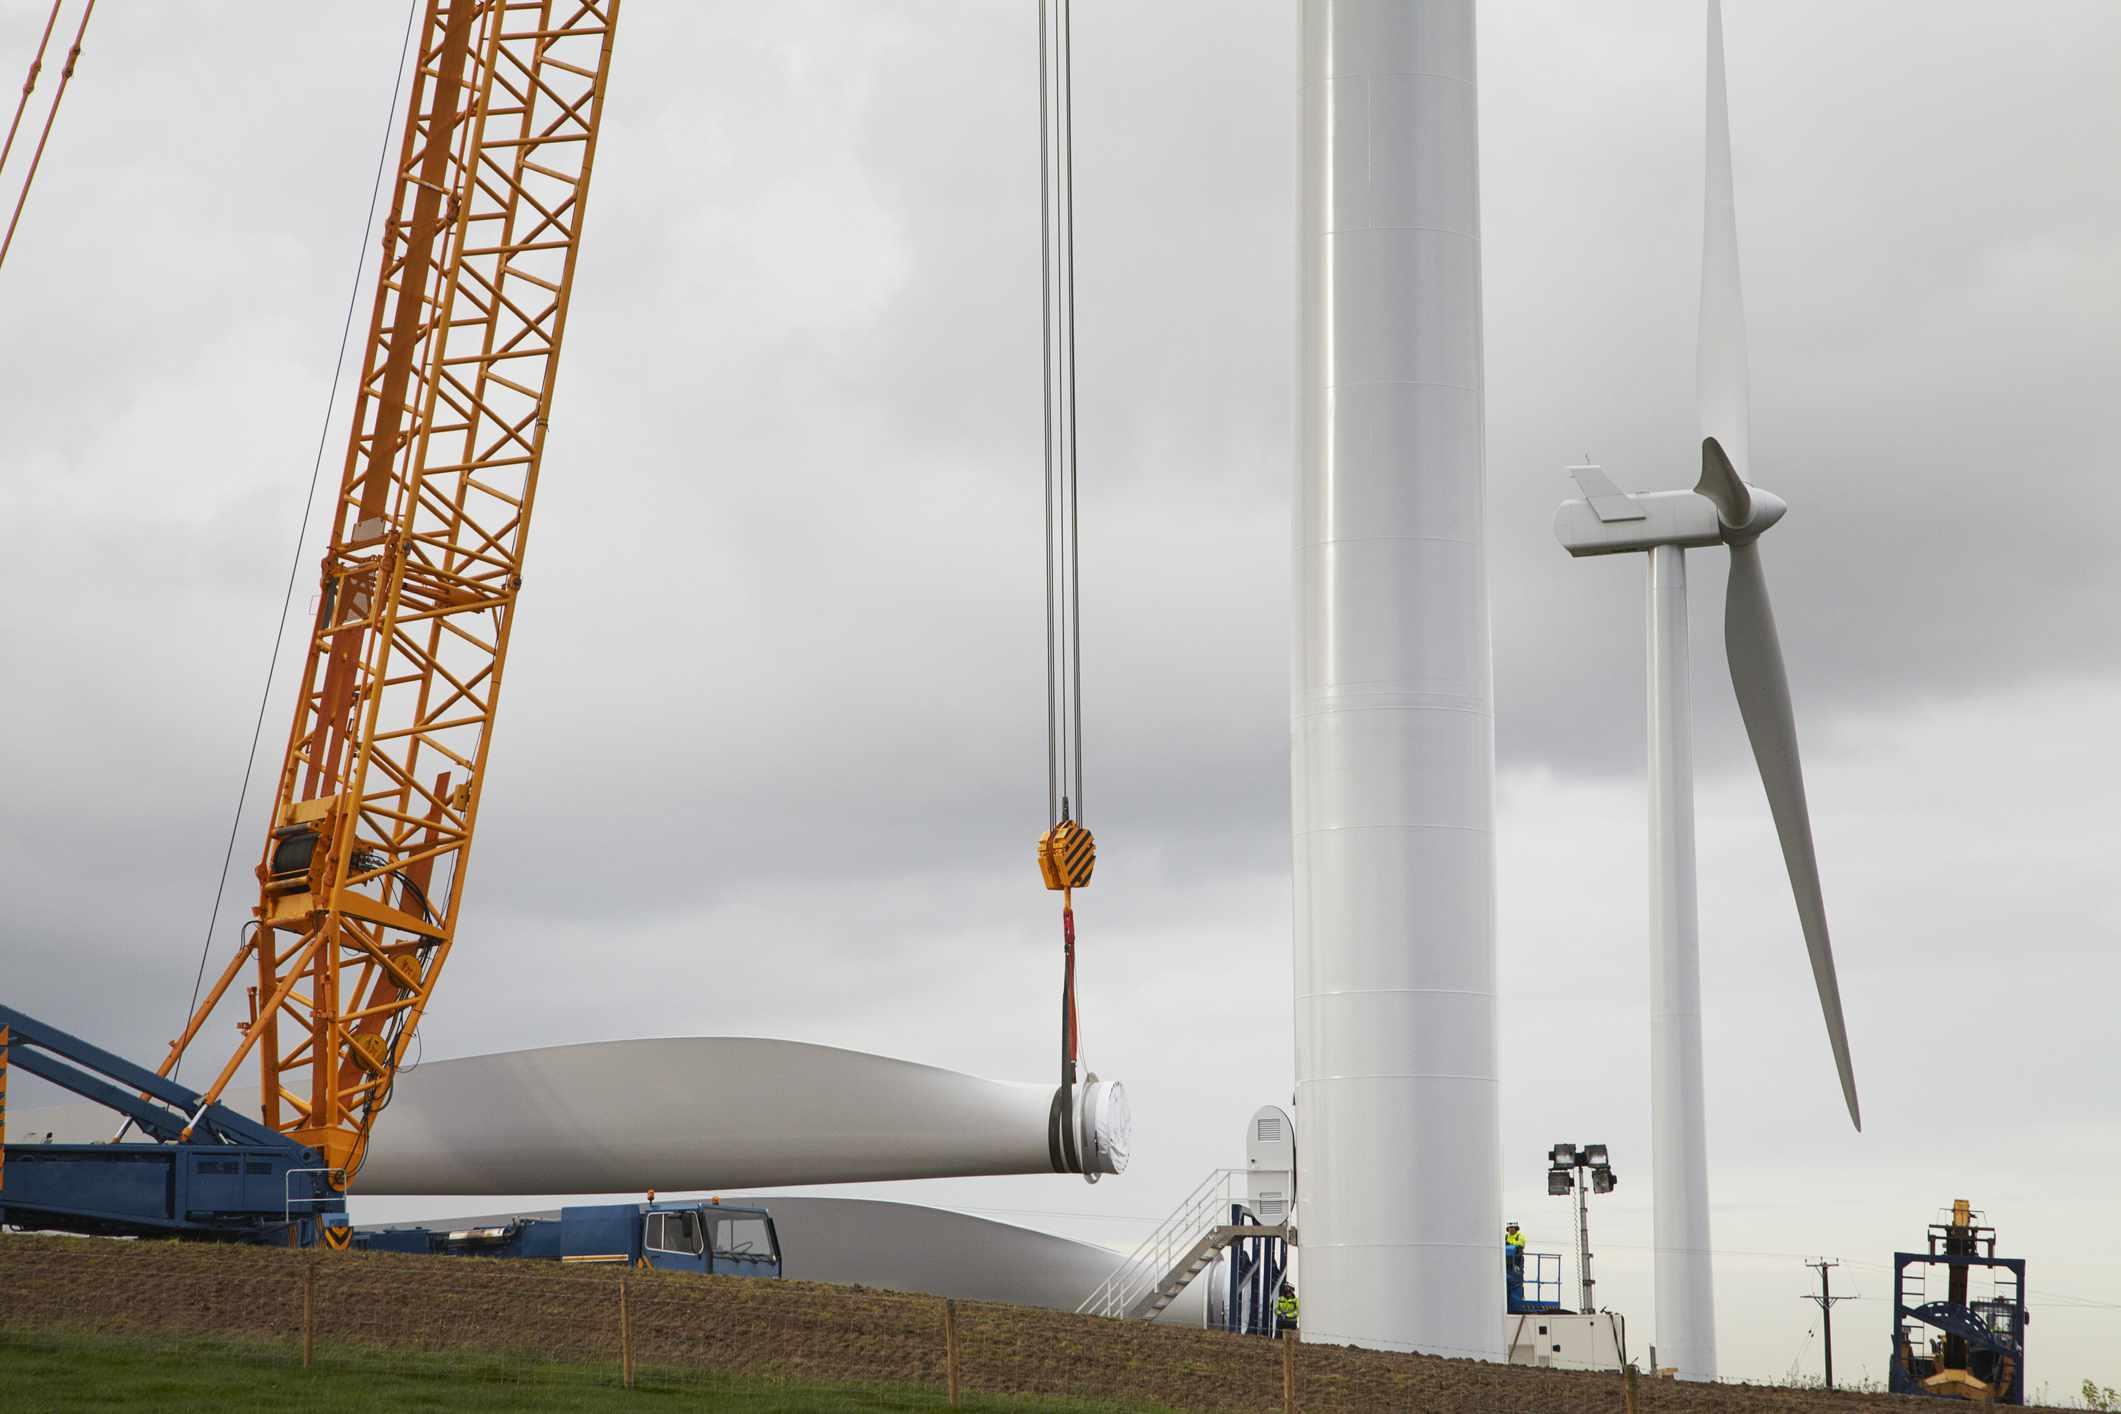 Wind turbine being erected